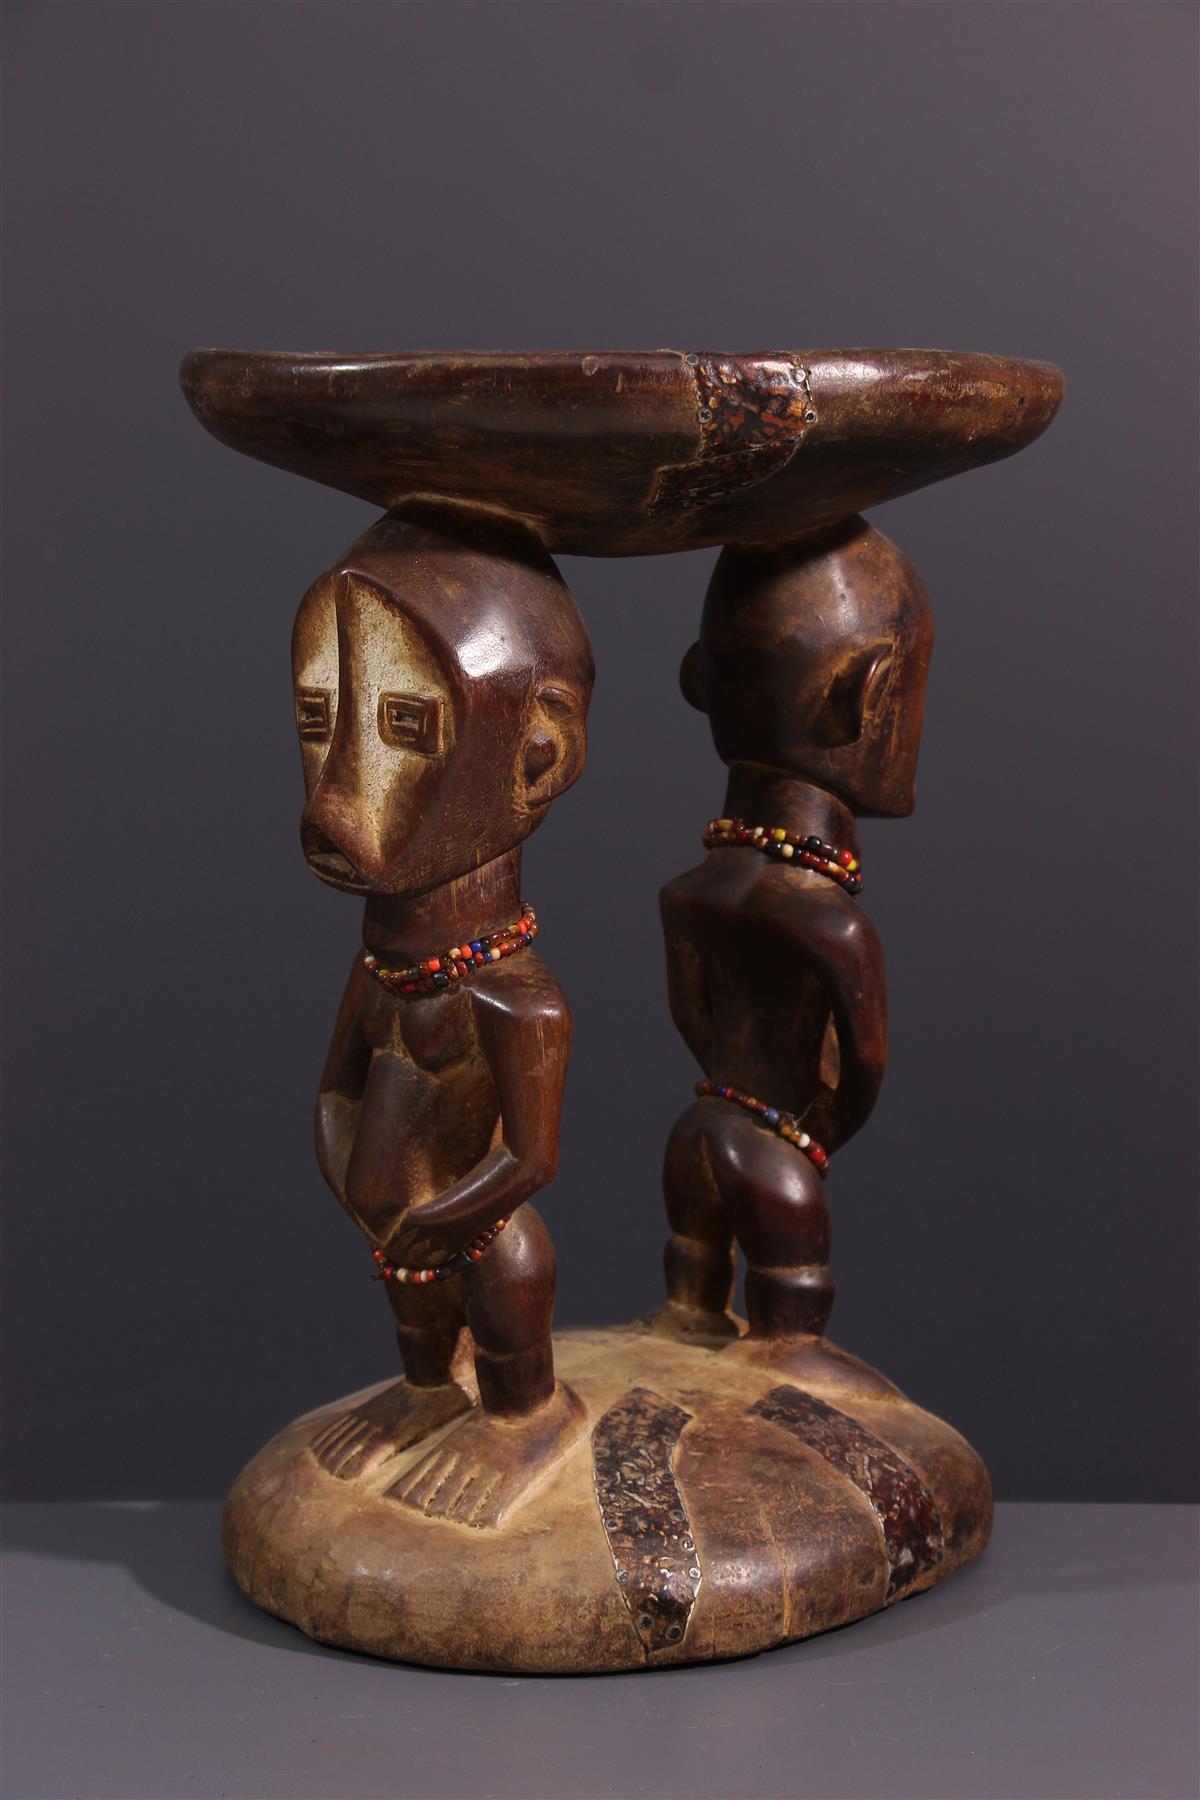 Ngala stool - African art